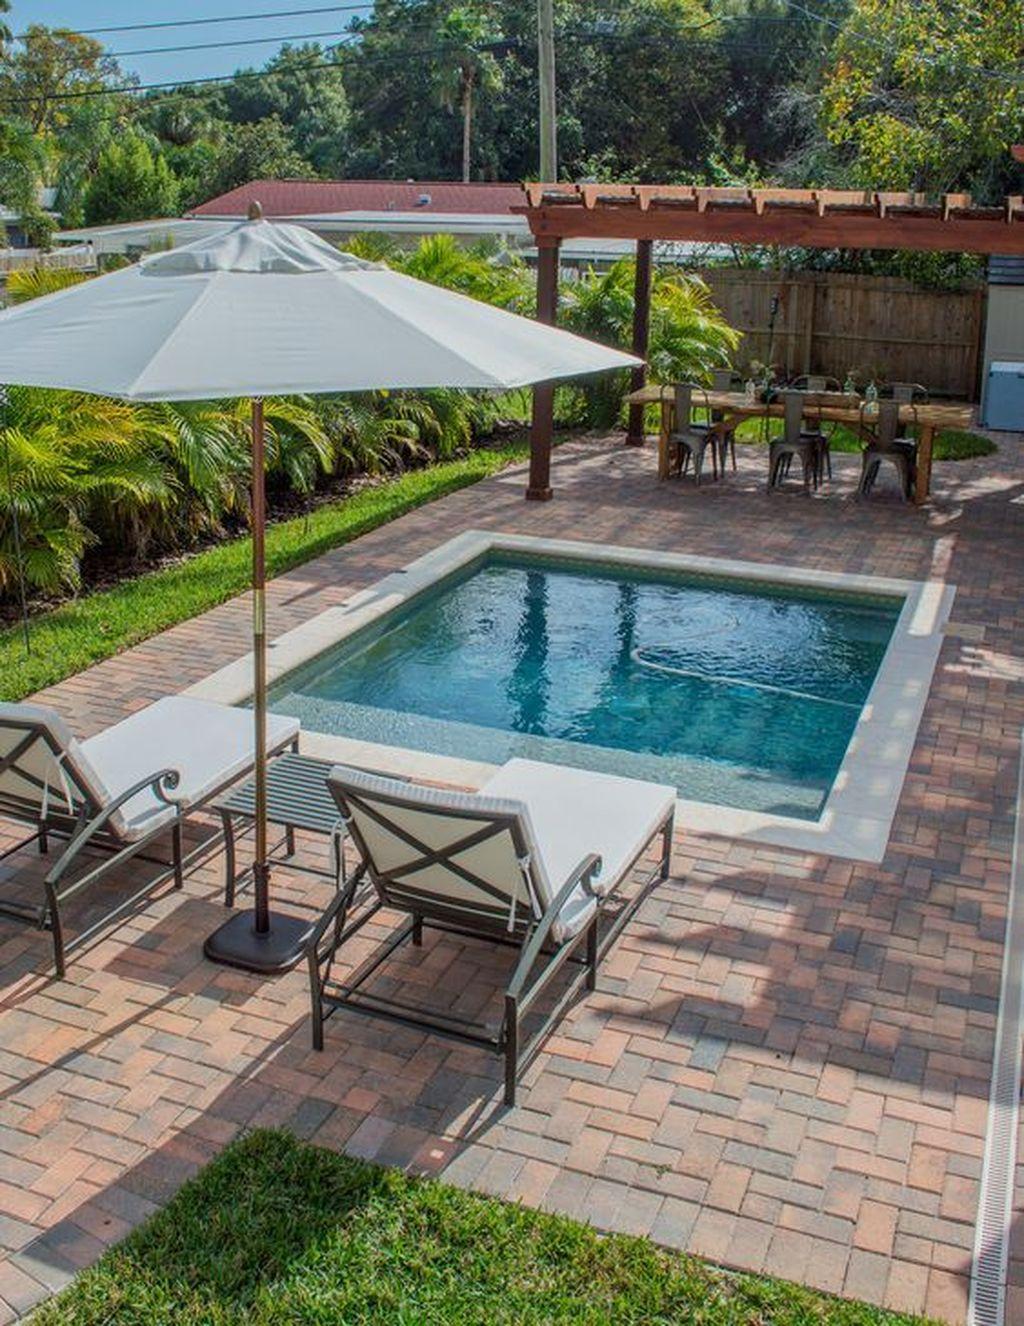 Admirable Small Swimming Pool Designs Ideas 28